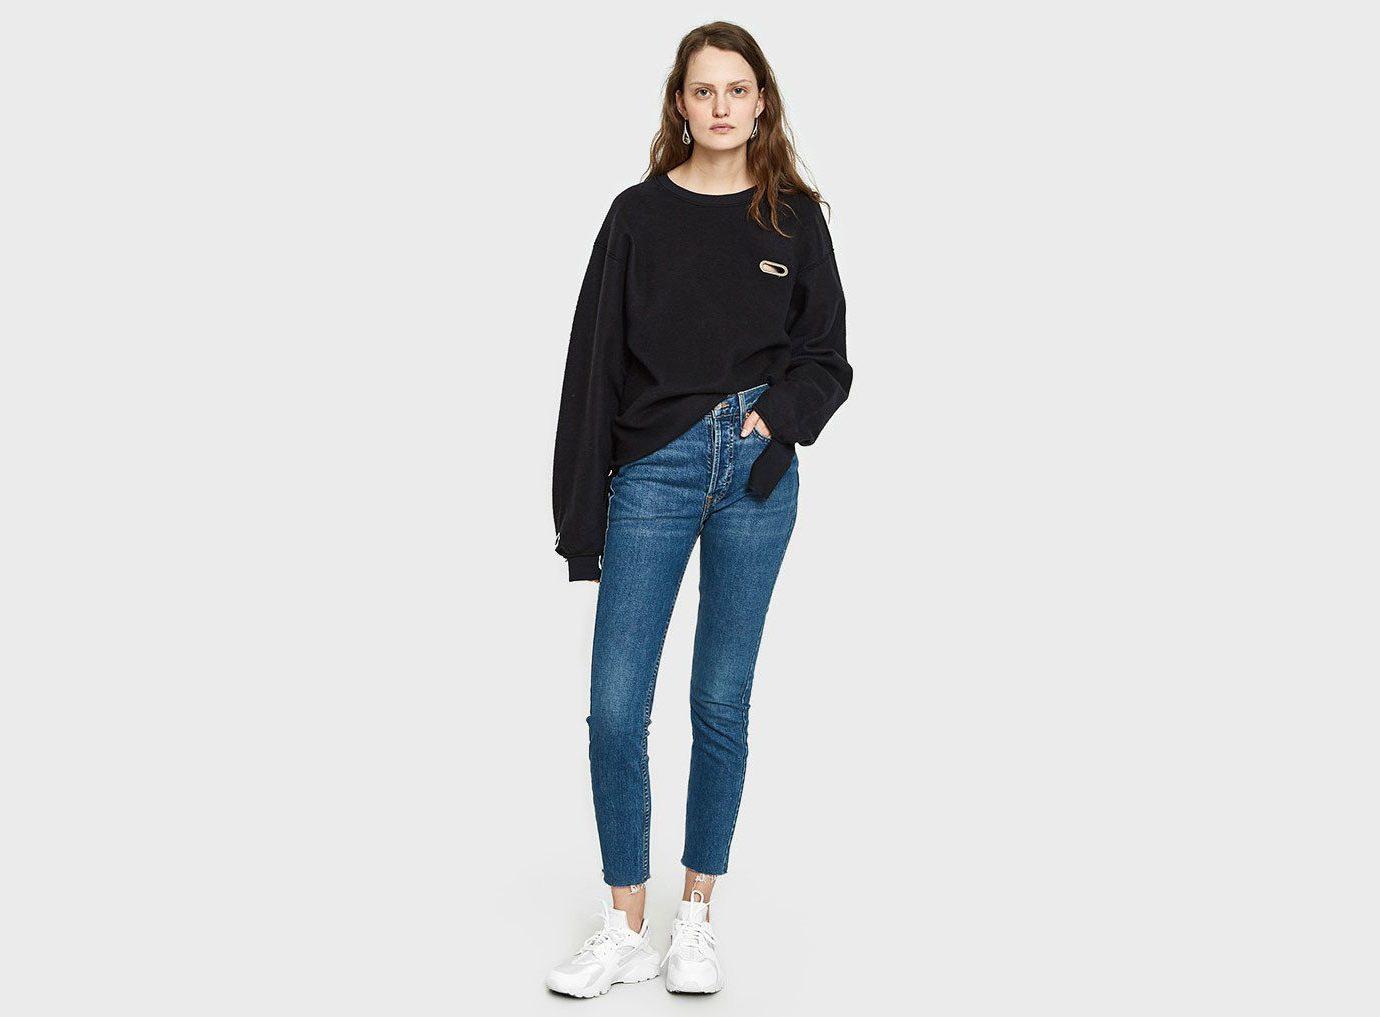 Packing Tips Style + Design Travel Shop clothing jeans shoulder denim sleeve joint fashion model electric blue neck waist trousers shoe pocket trouser